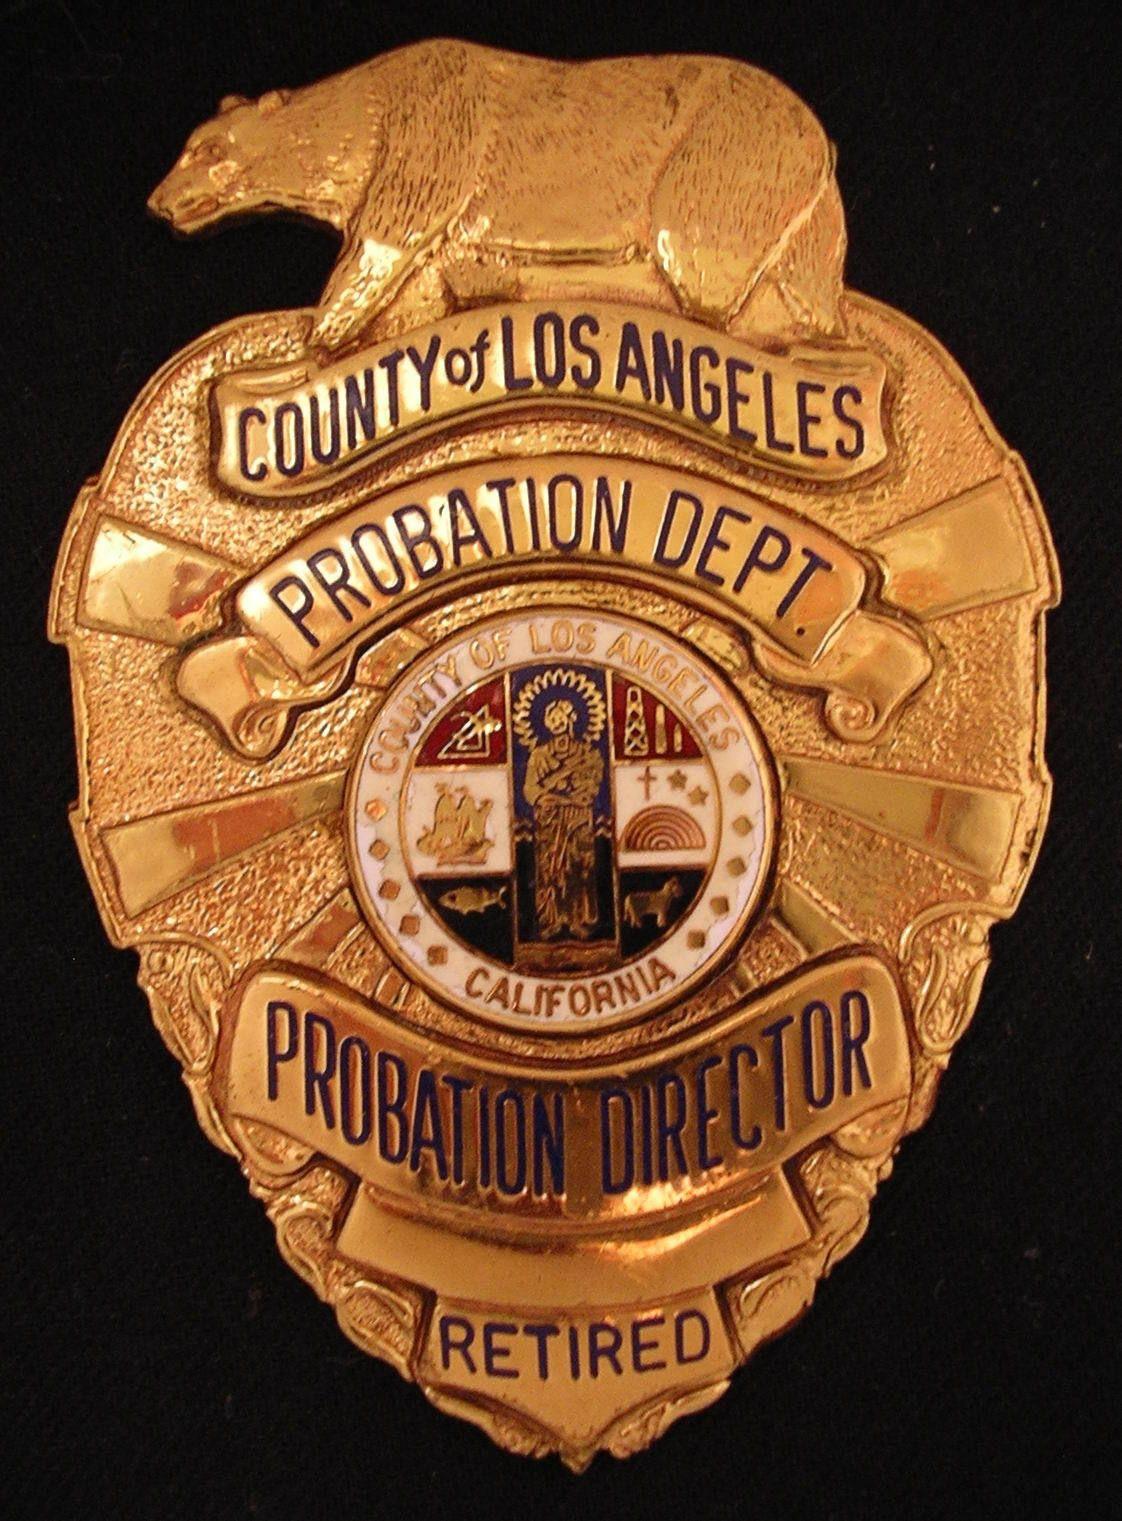 Probation Director, City of Los Angeles County Probation